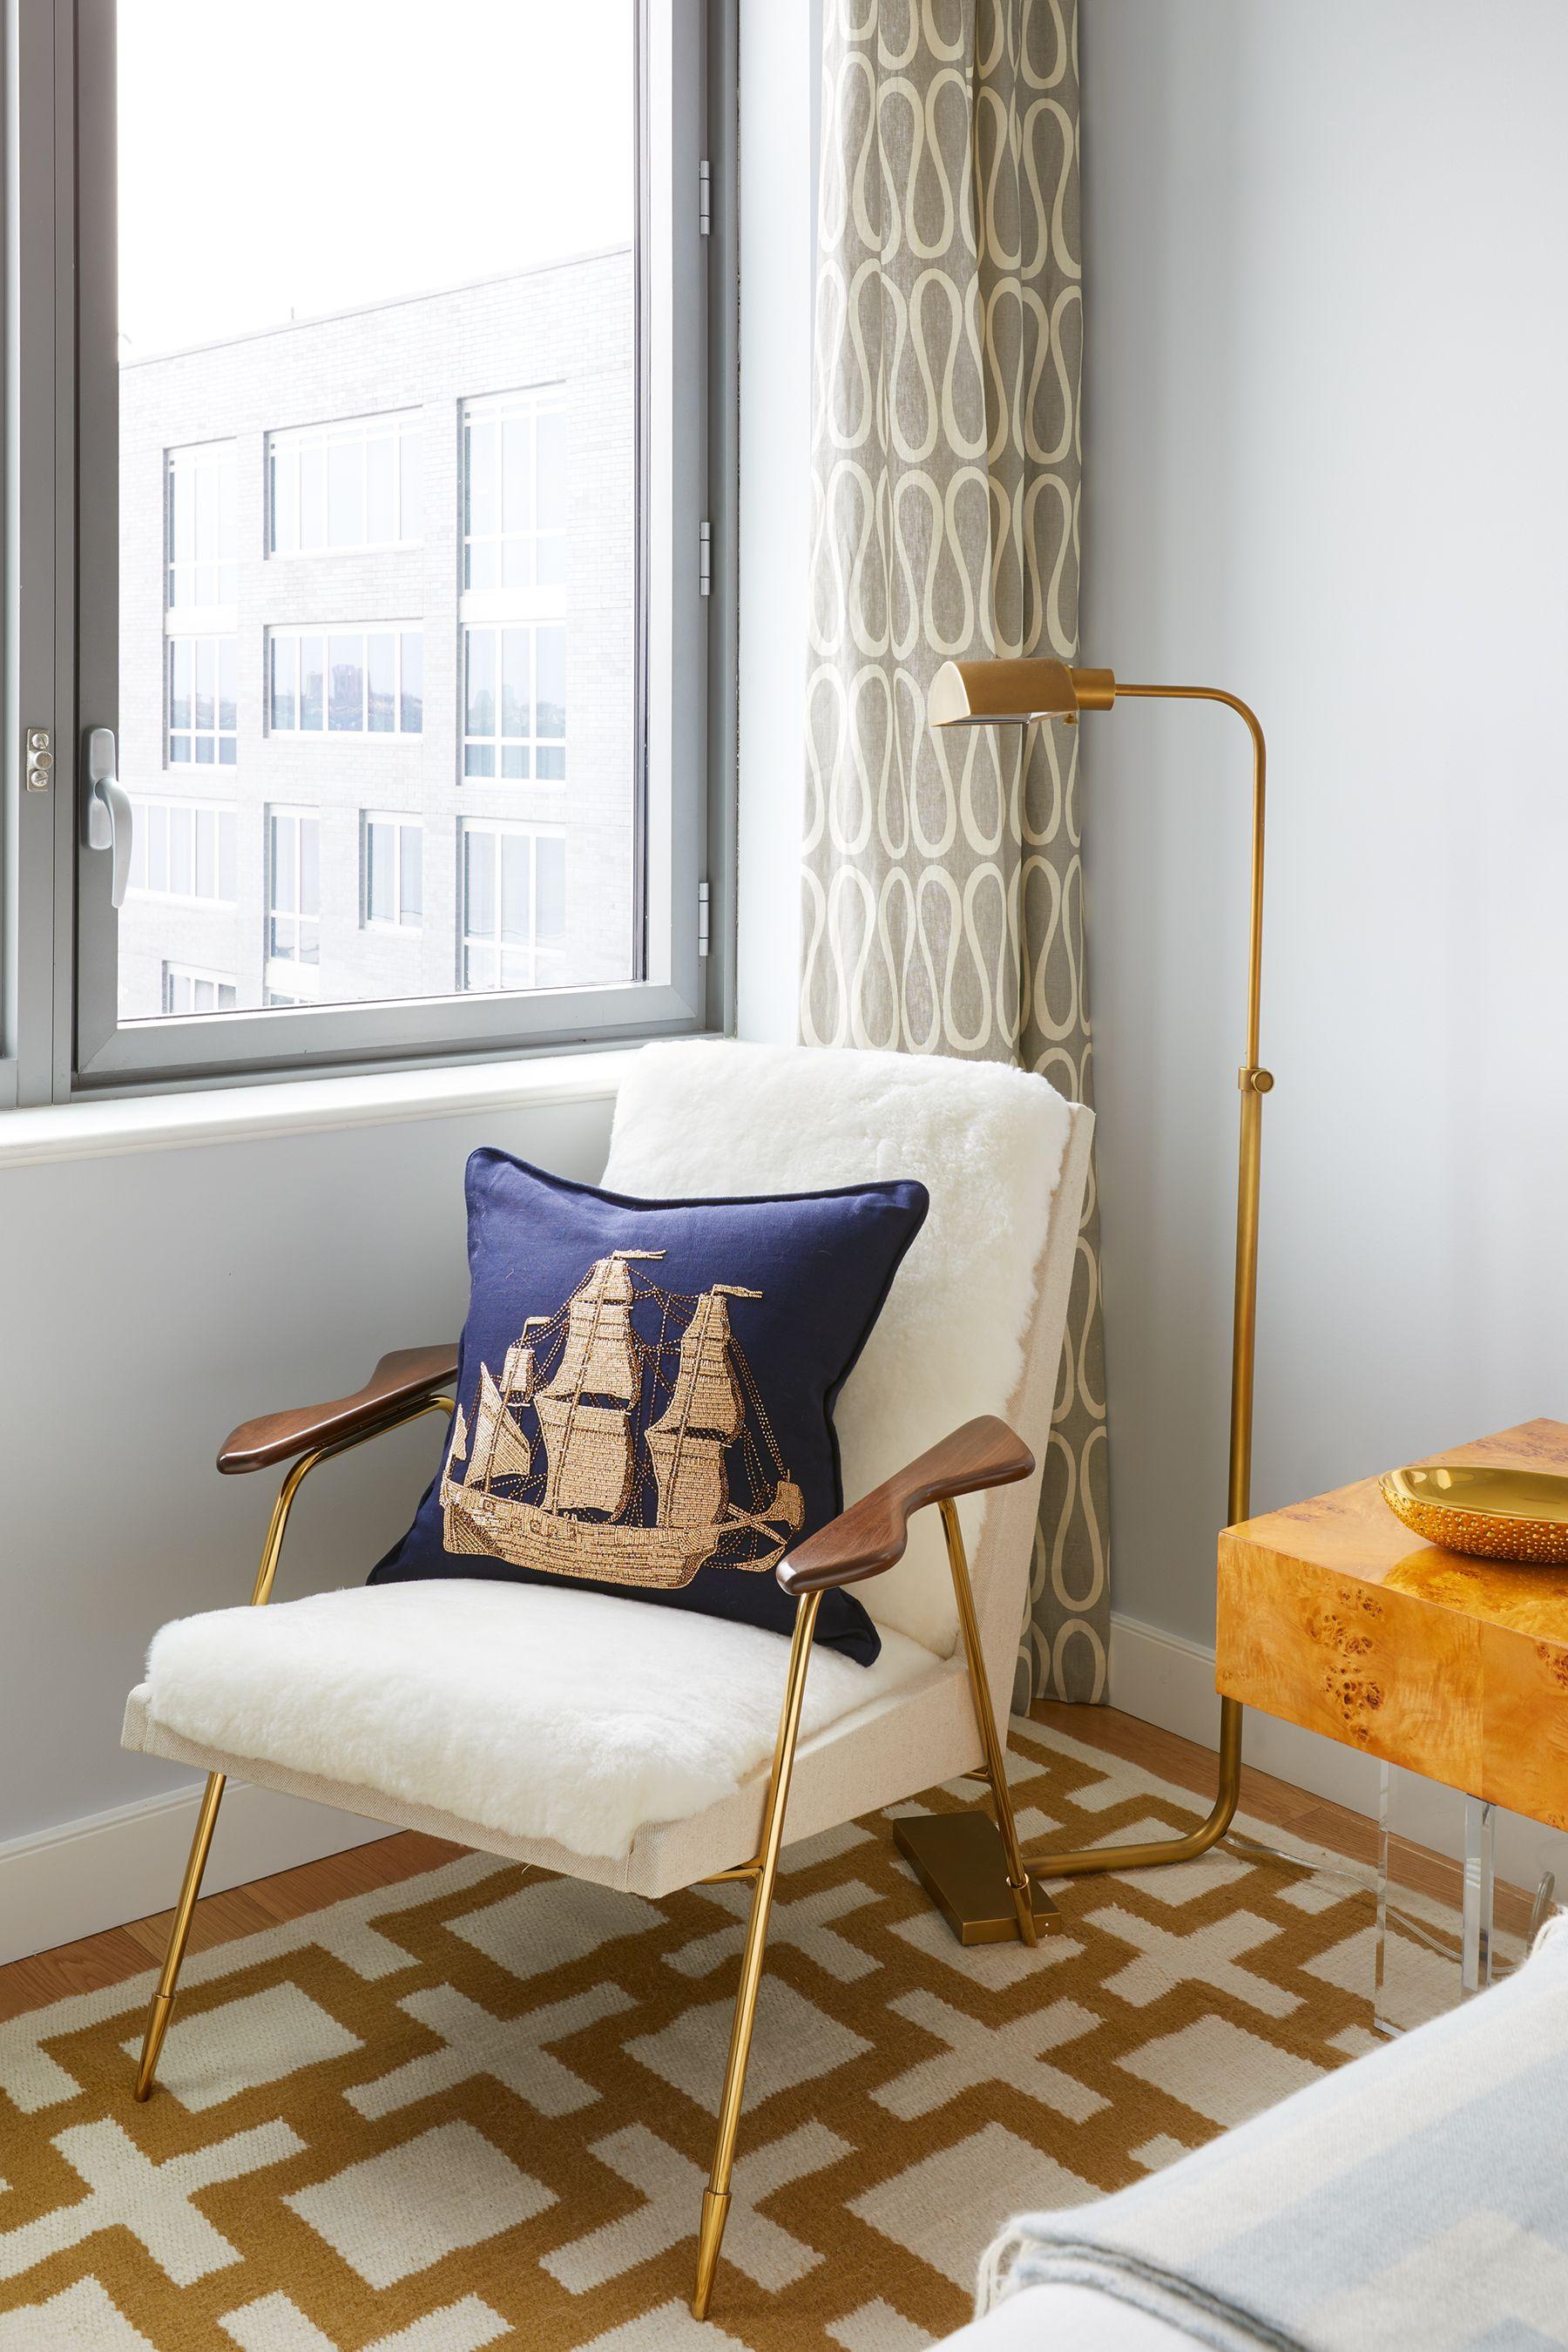 Jonathan Adler Ingmar Chair In 2019 606 West 57th Street Chair